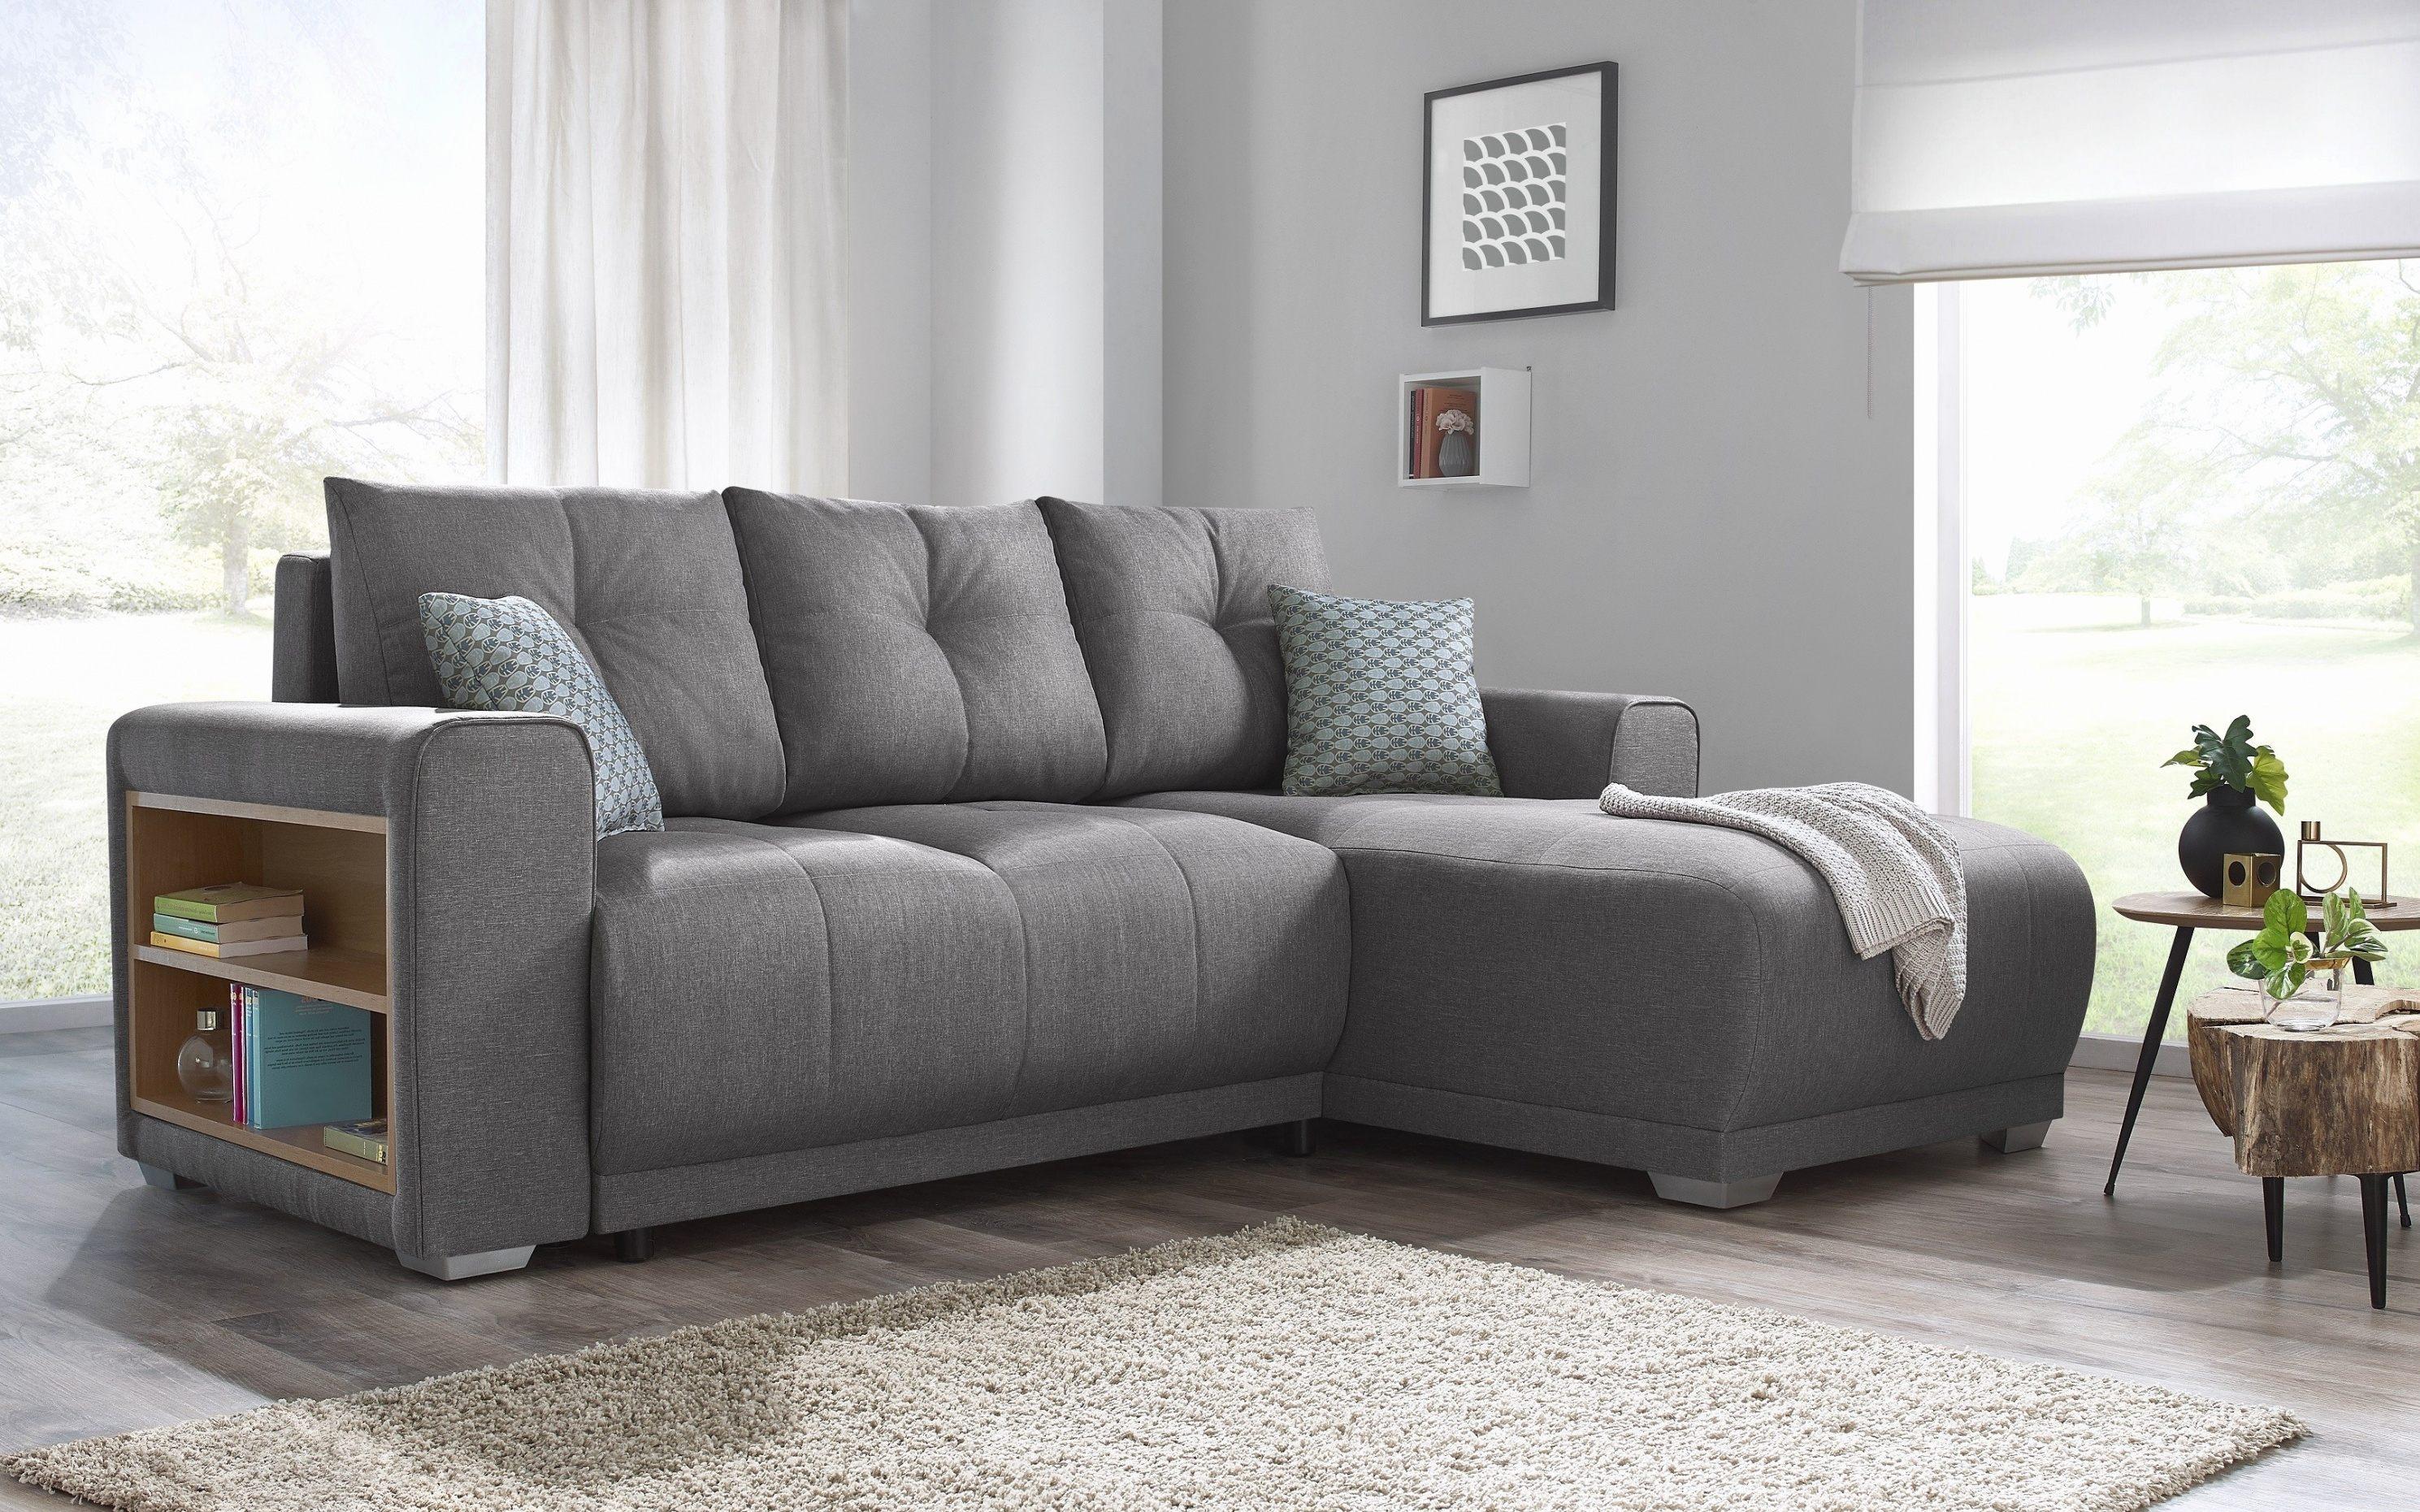 Lit Gigogne Canapé Frais Surprenant Conforama Canapé Angle Convertible Avec Canapé Lit Design